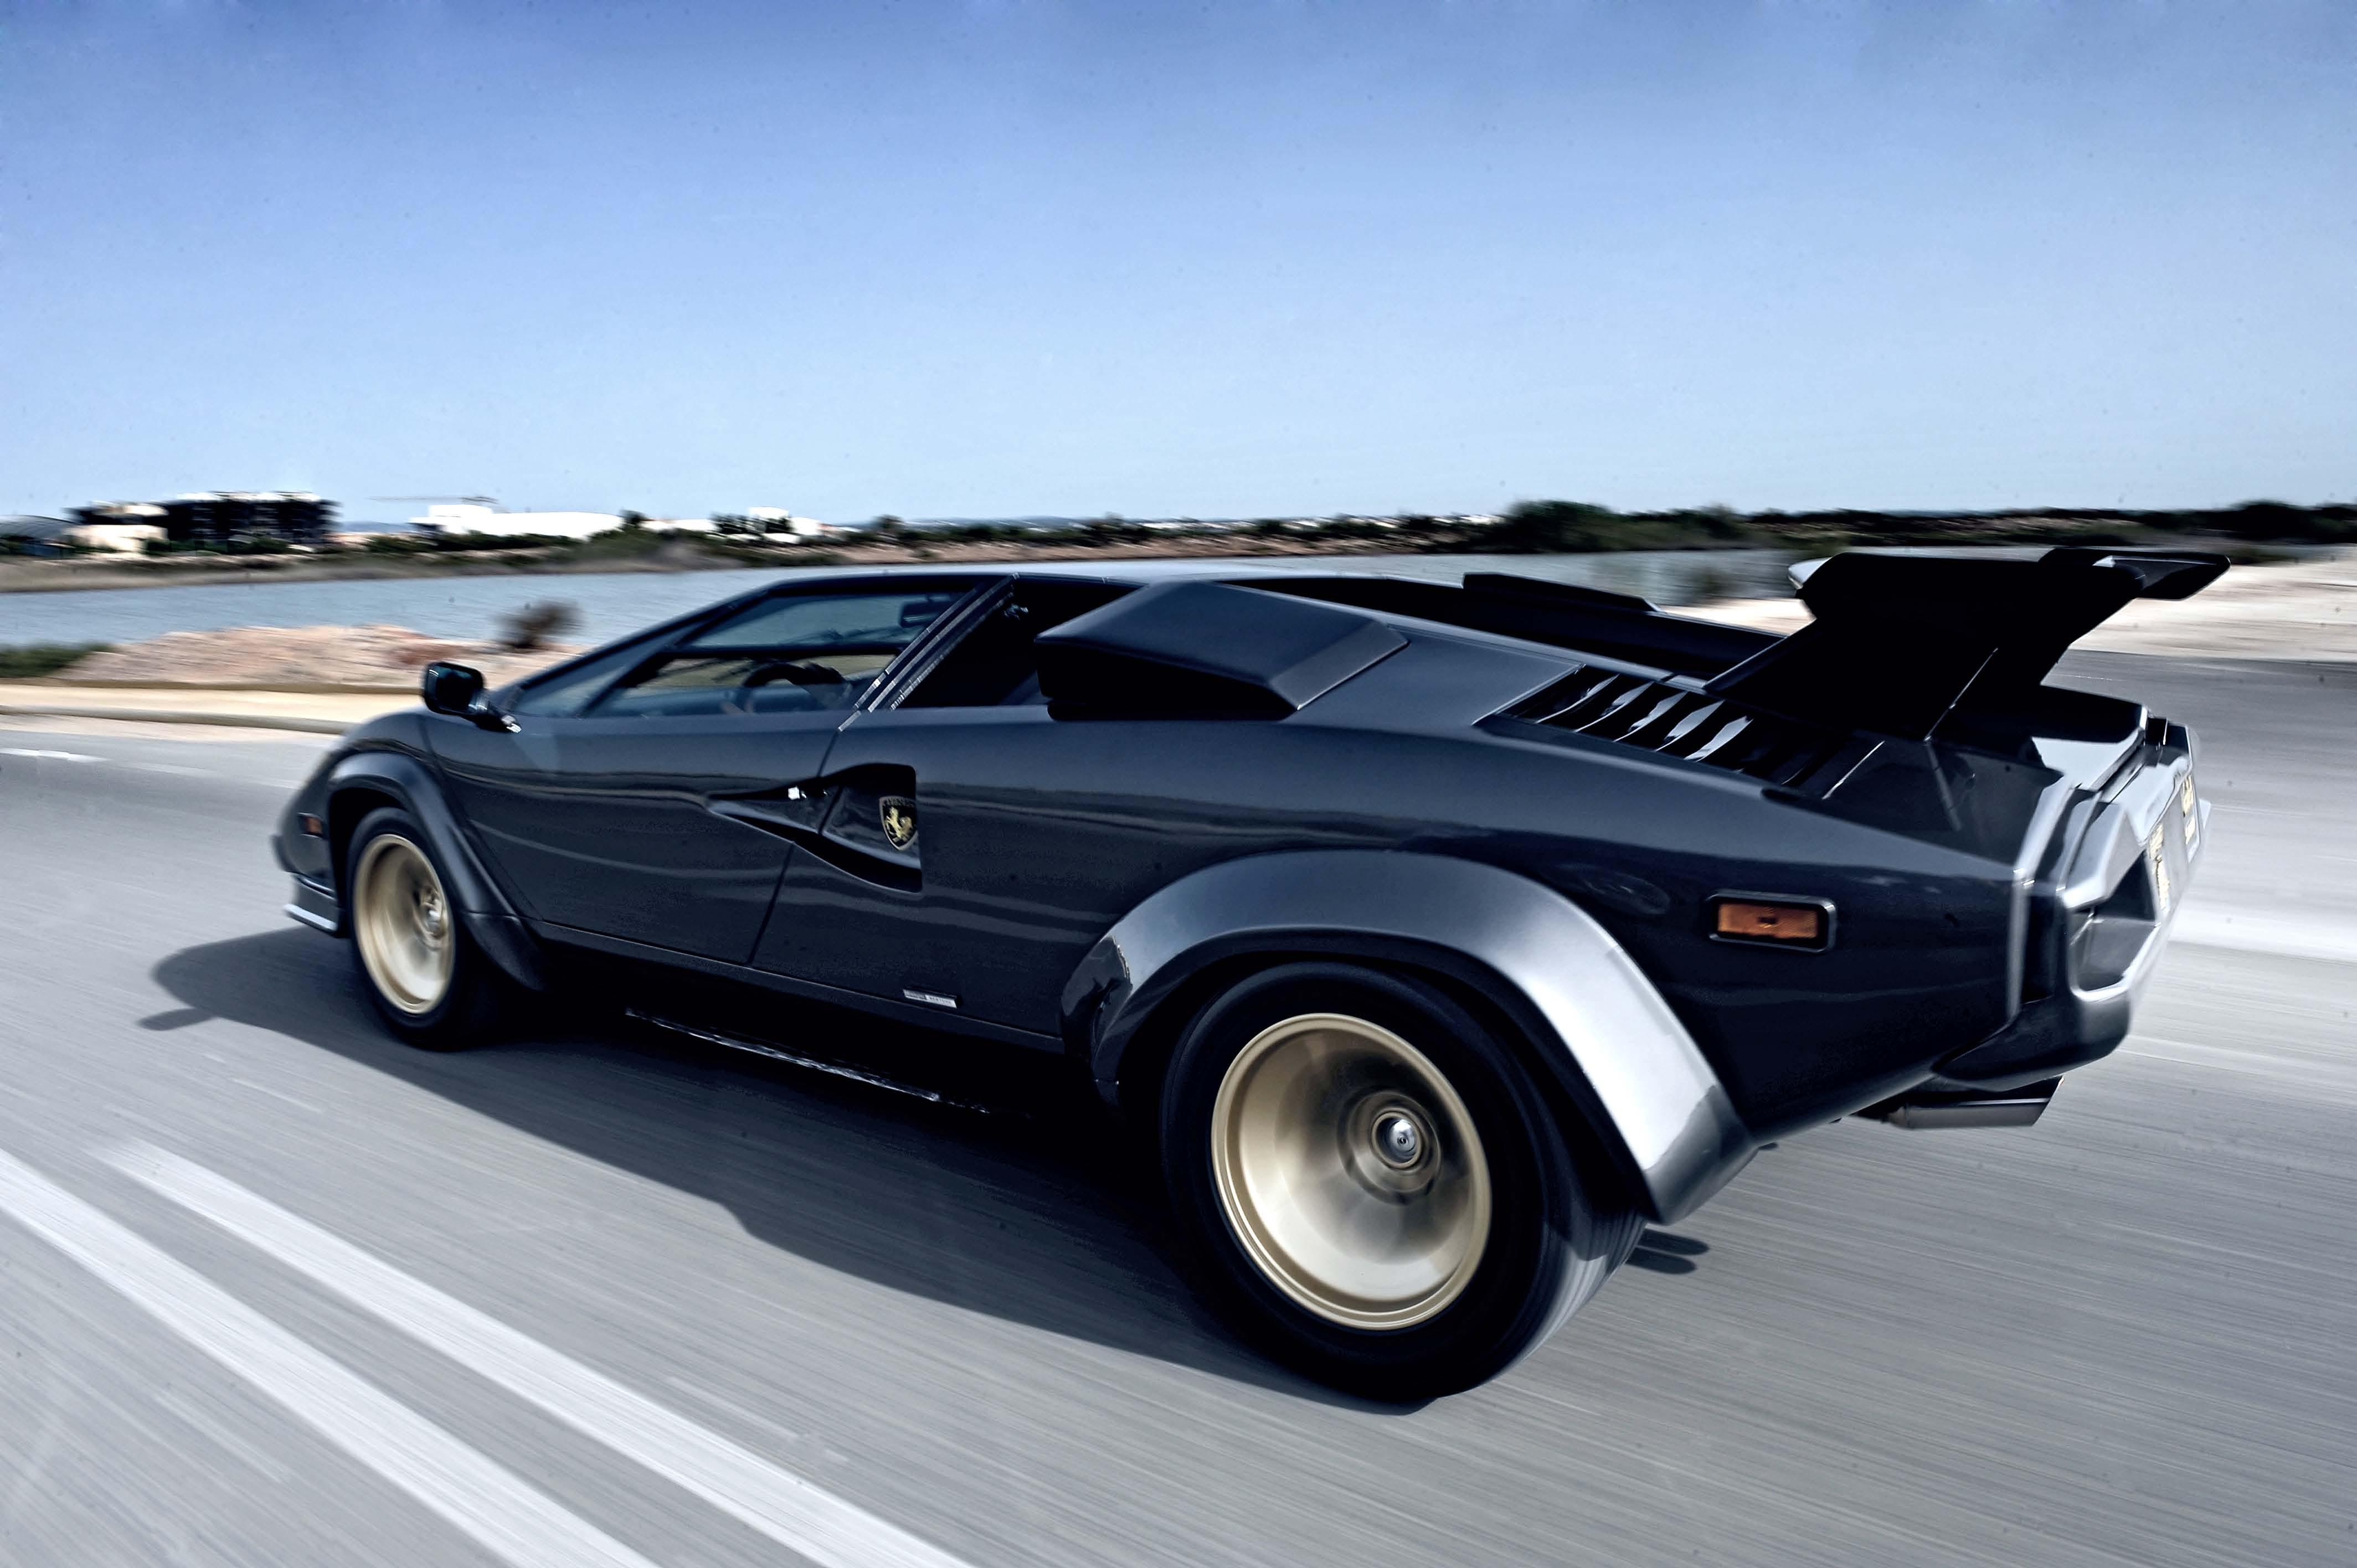 Lamborghini Countach Wallpapers Wallpaper Cave